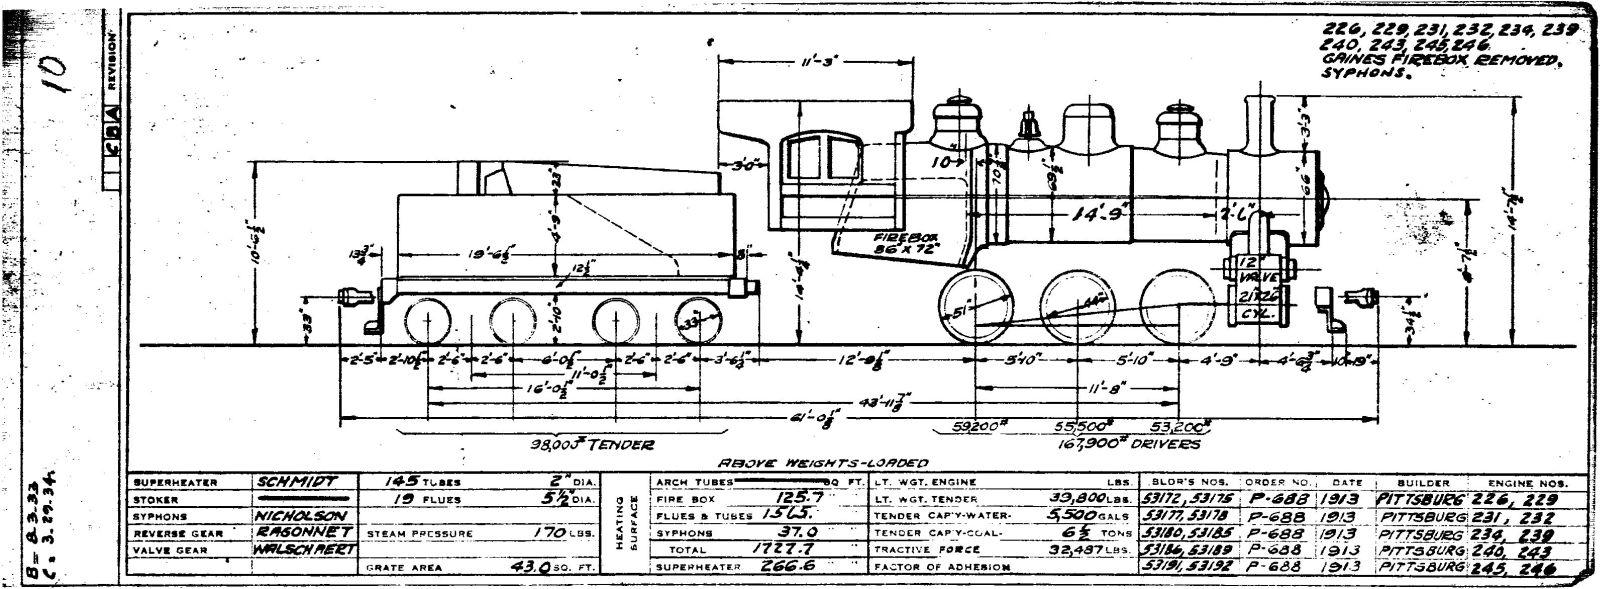 13 - locomotives 641-644 14 - locomotives 651-670, 671-730 15 - locomotives  731-739, 741-785 16 - locomotive 798 17 - locomotives 941-957, 959-993